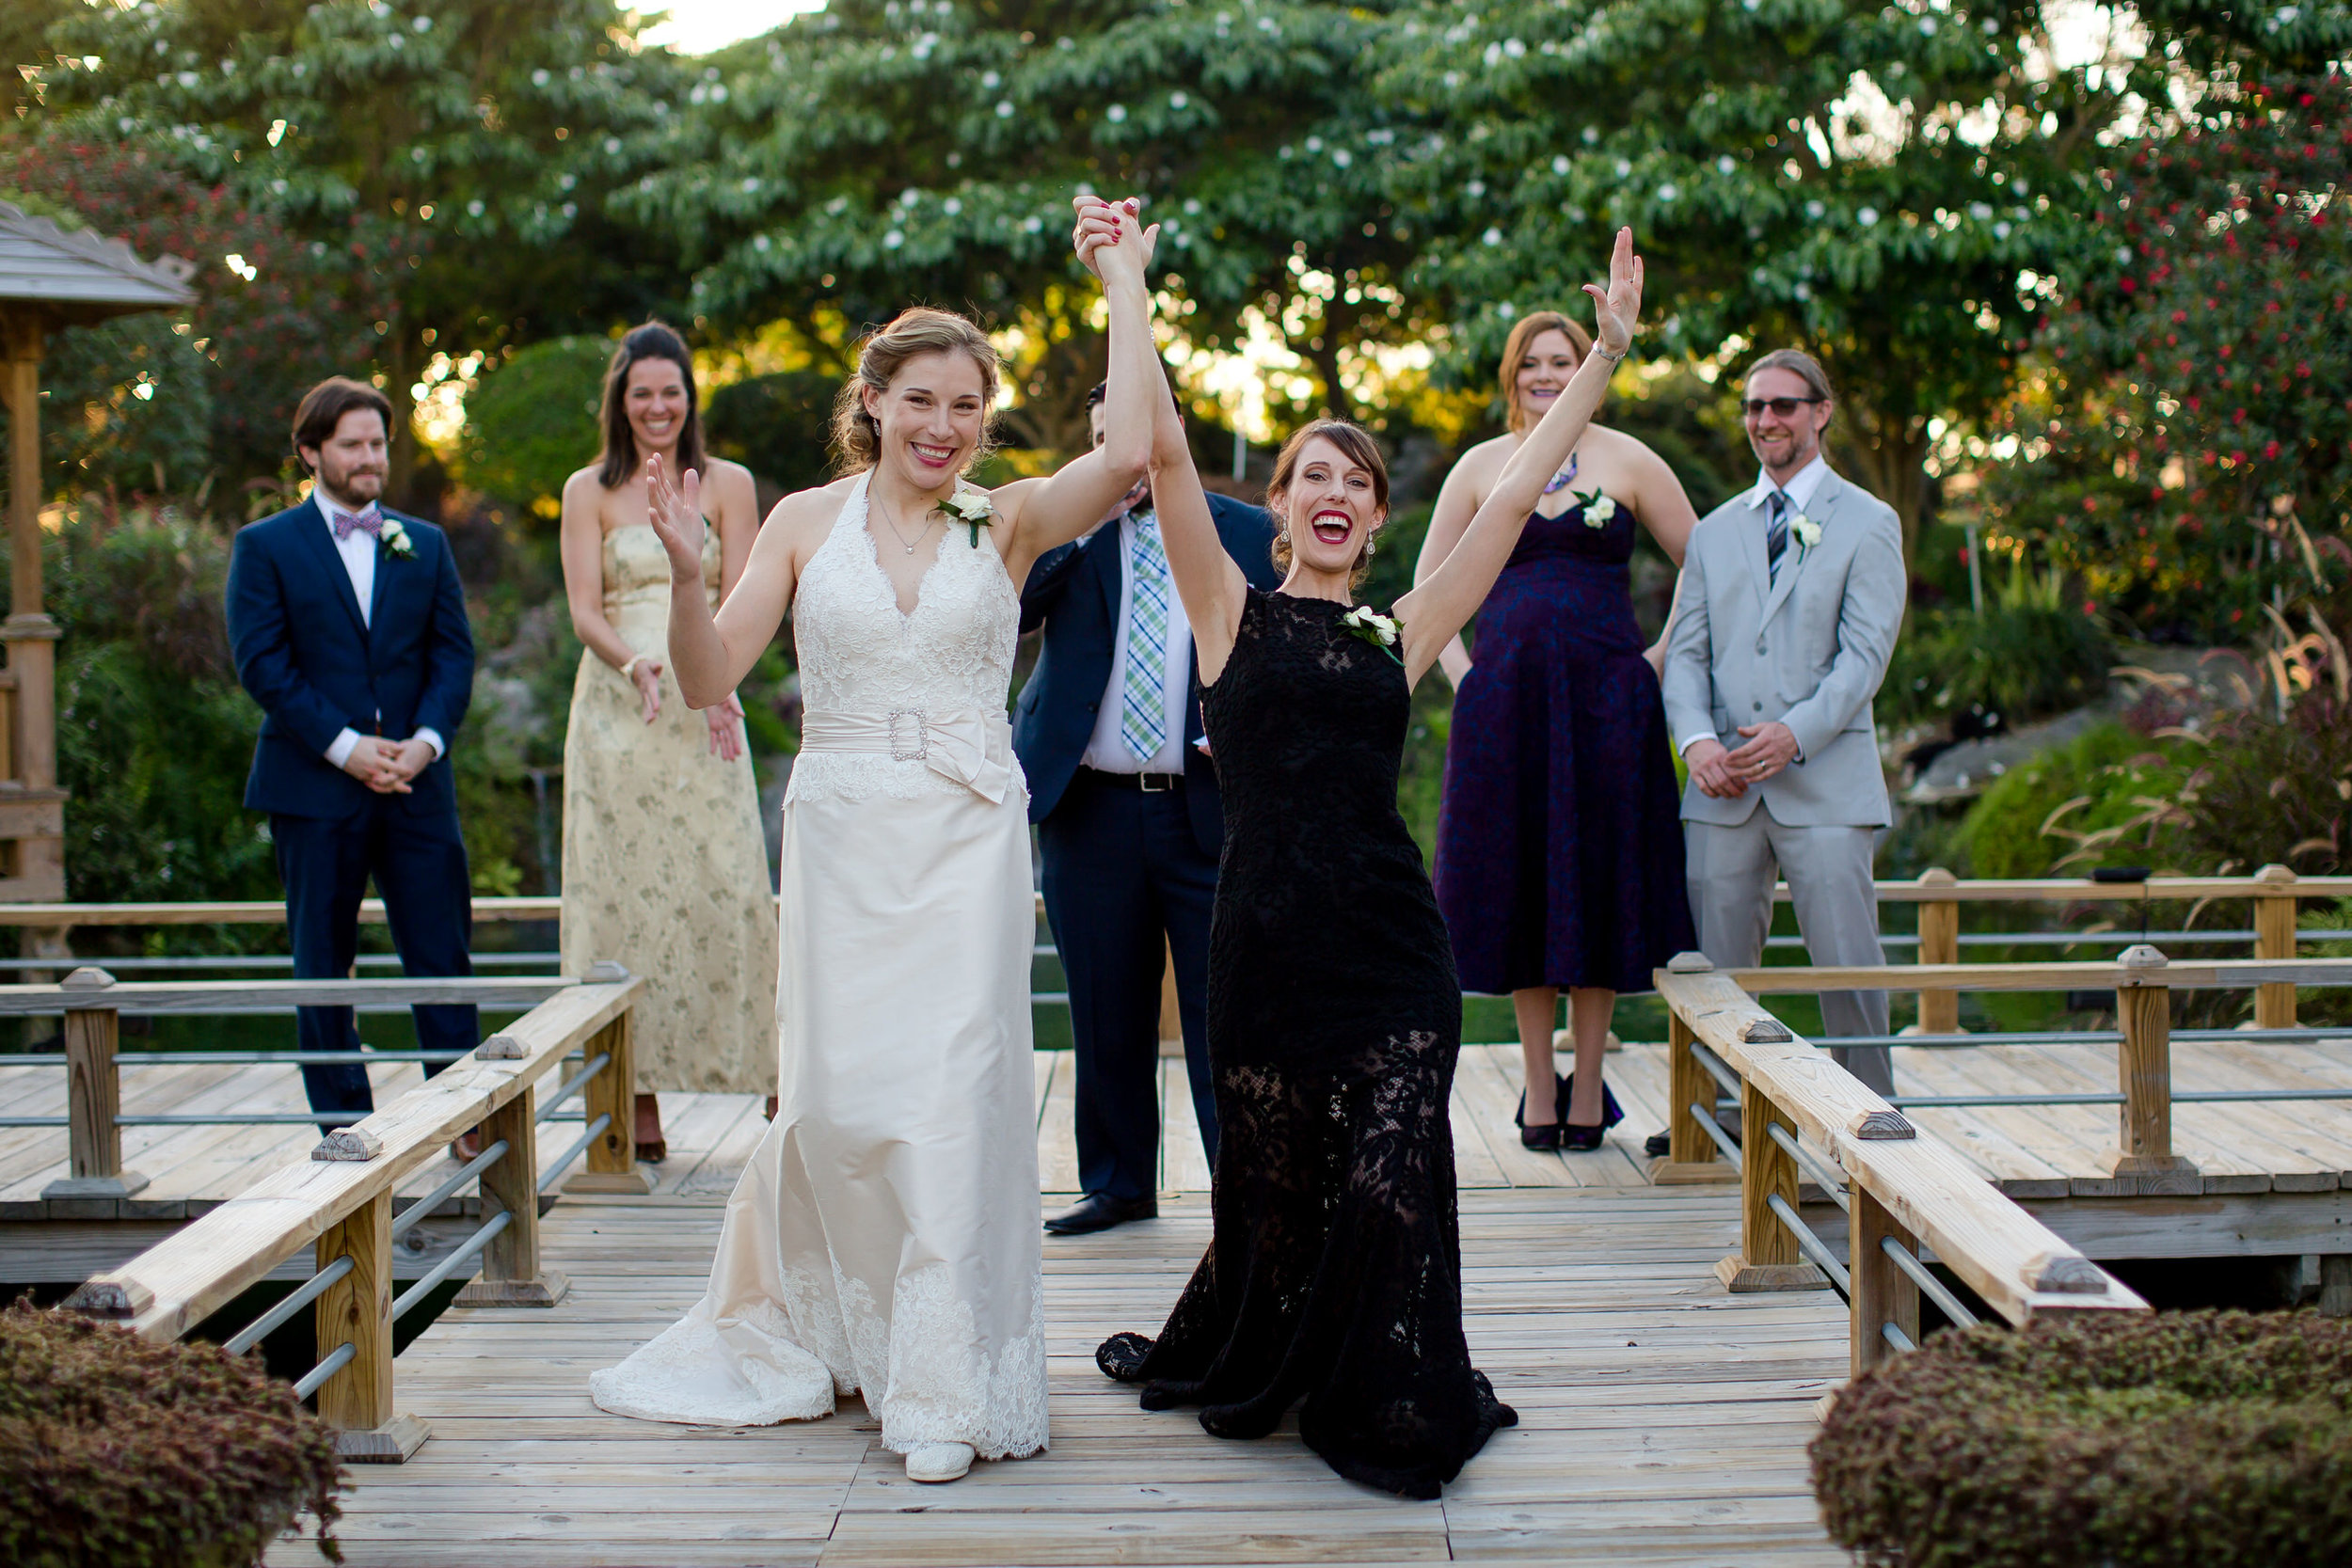 Gorgeous Brides Wedding at the Redland Koi Gardens in Homestead, FL by Tiny House Photo